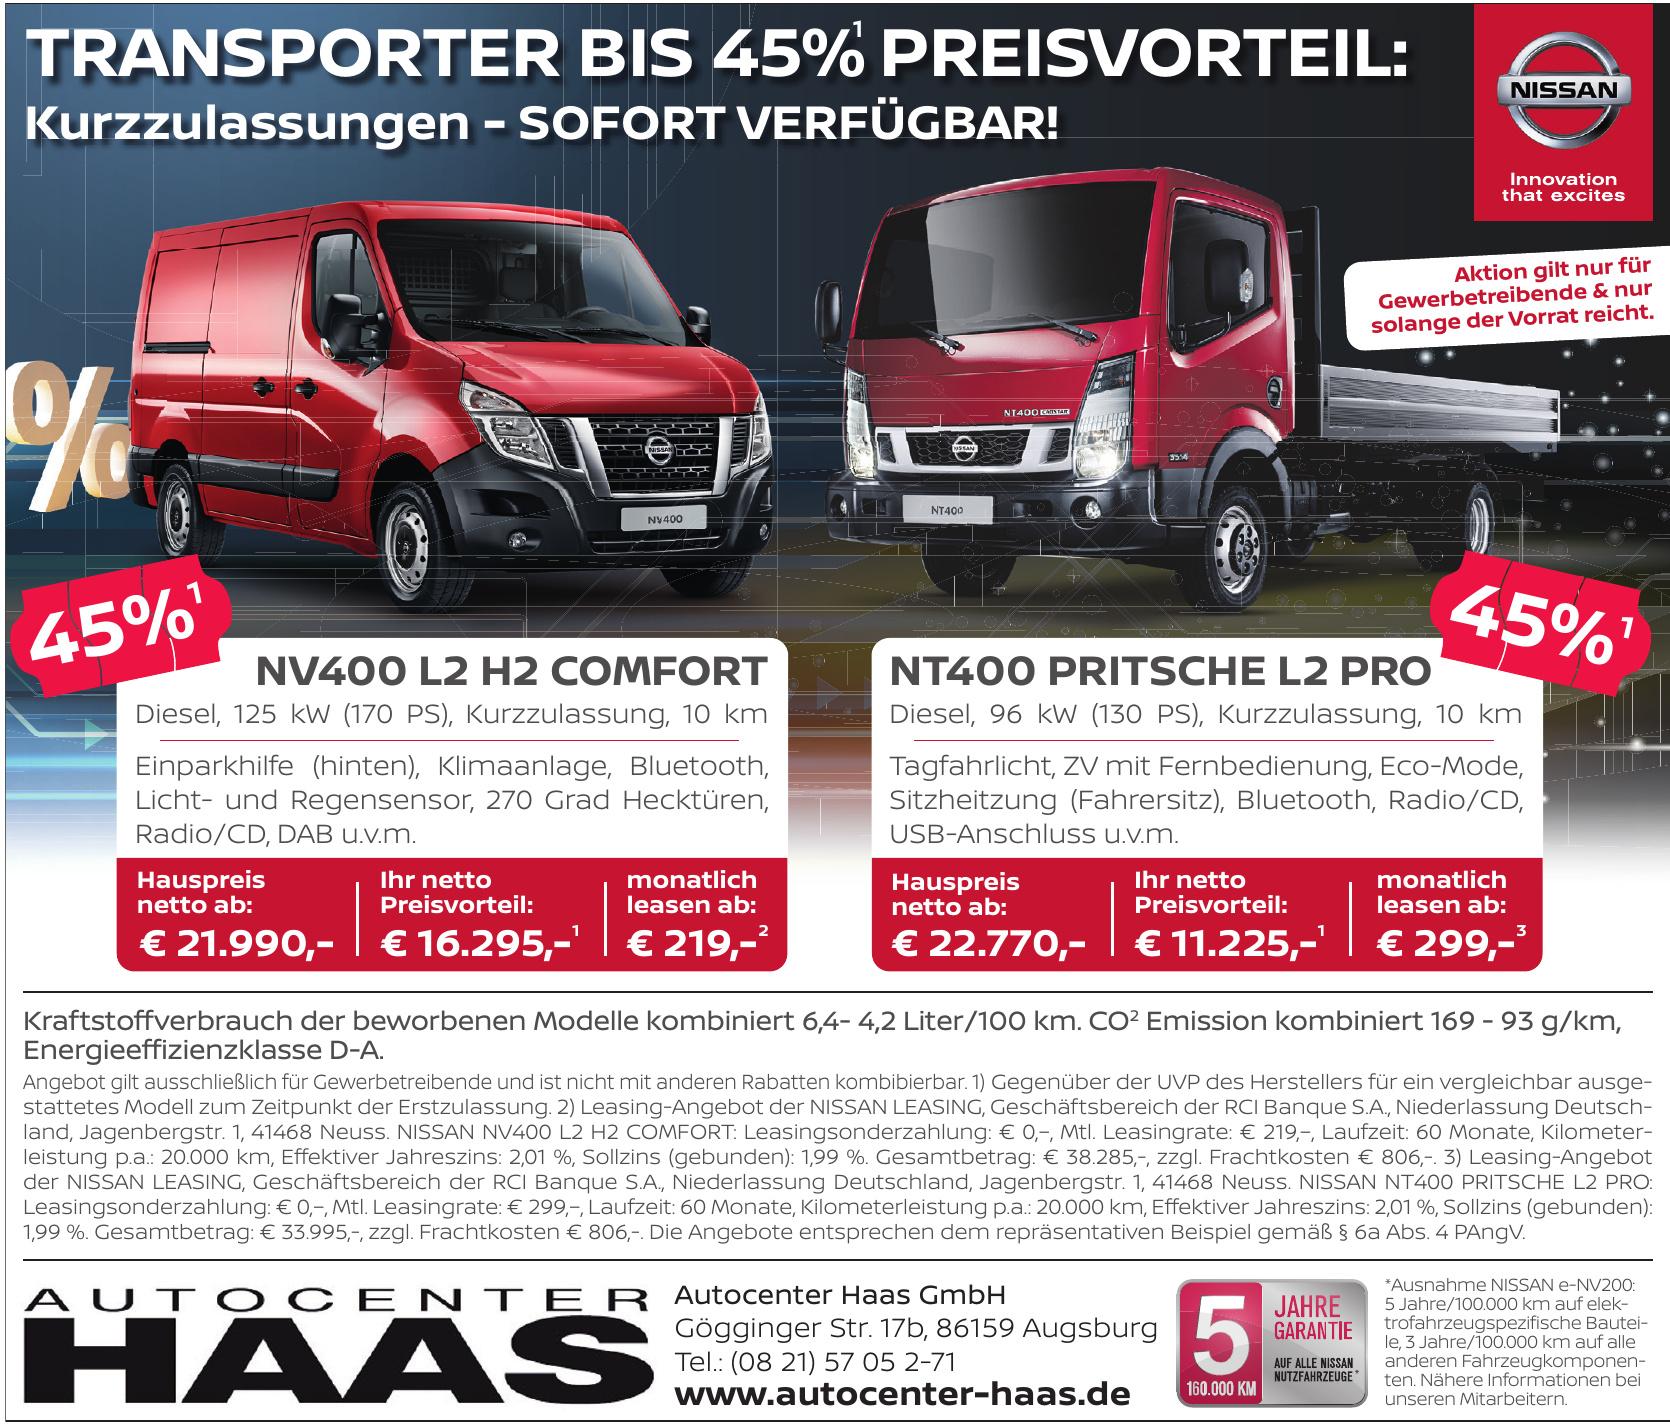 Autocenter Haas GmbH